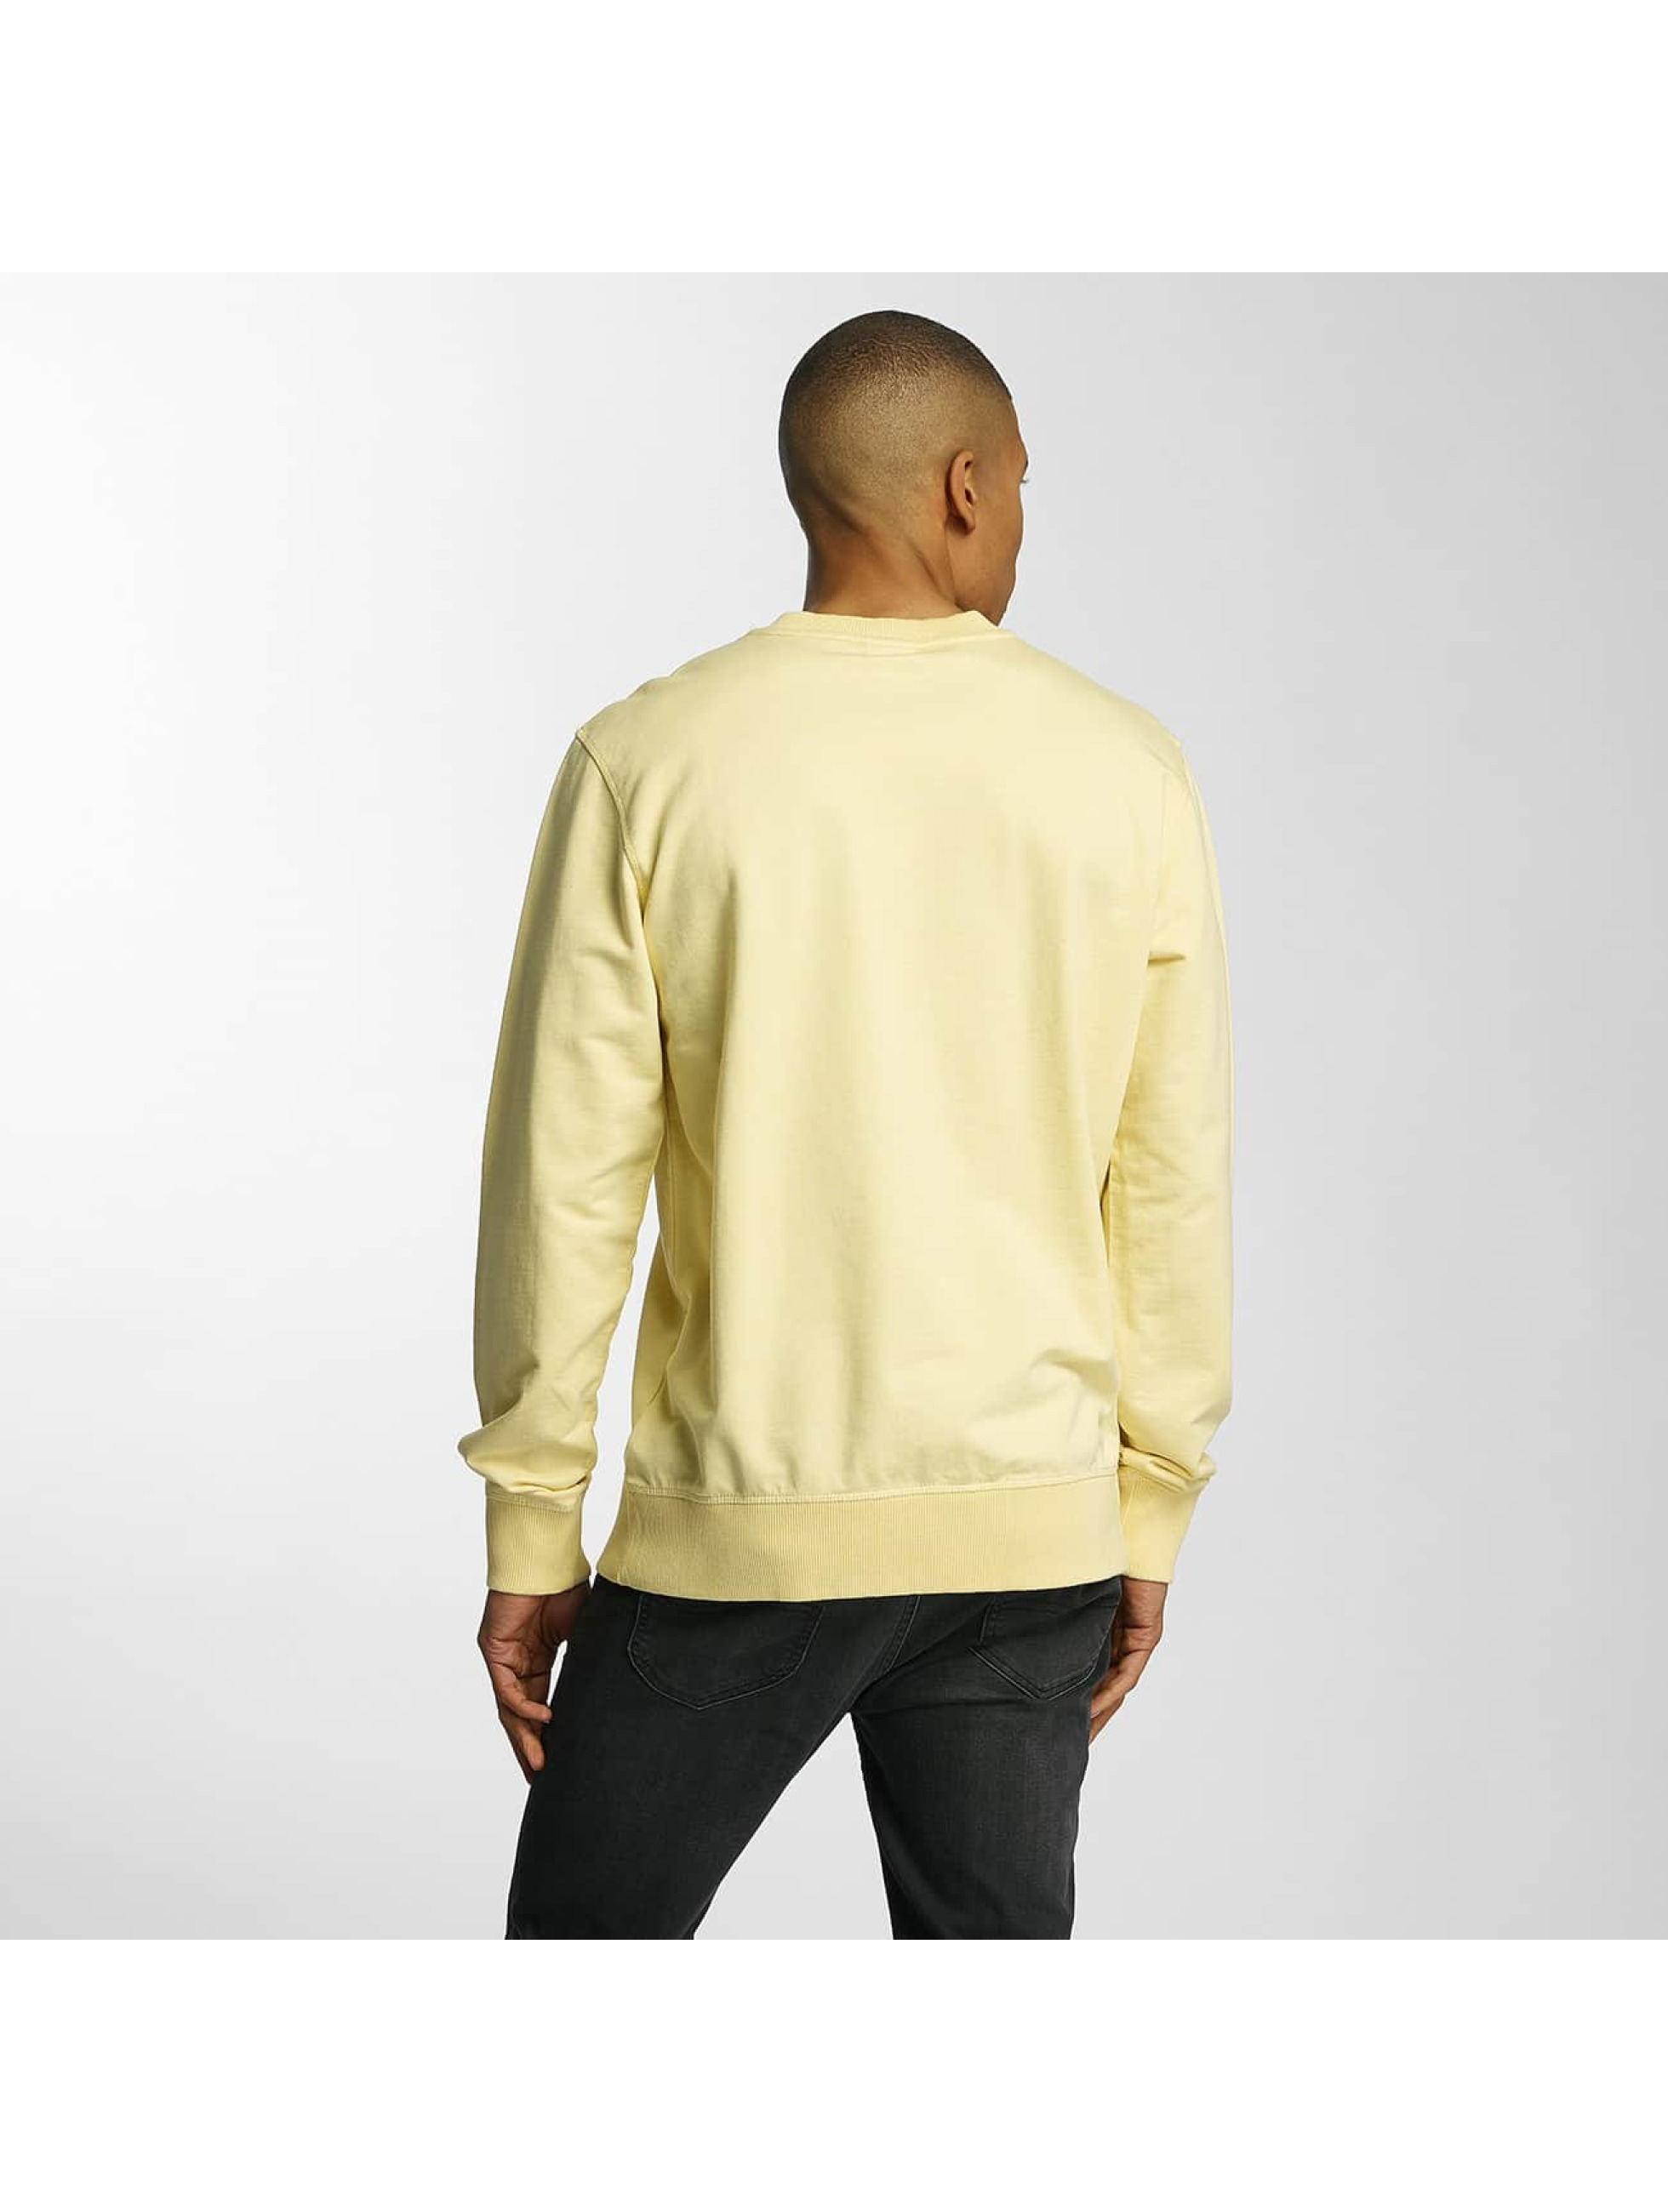 Timberland Sweat & Pull Stonybrook jaune